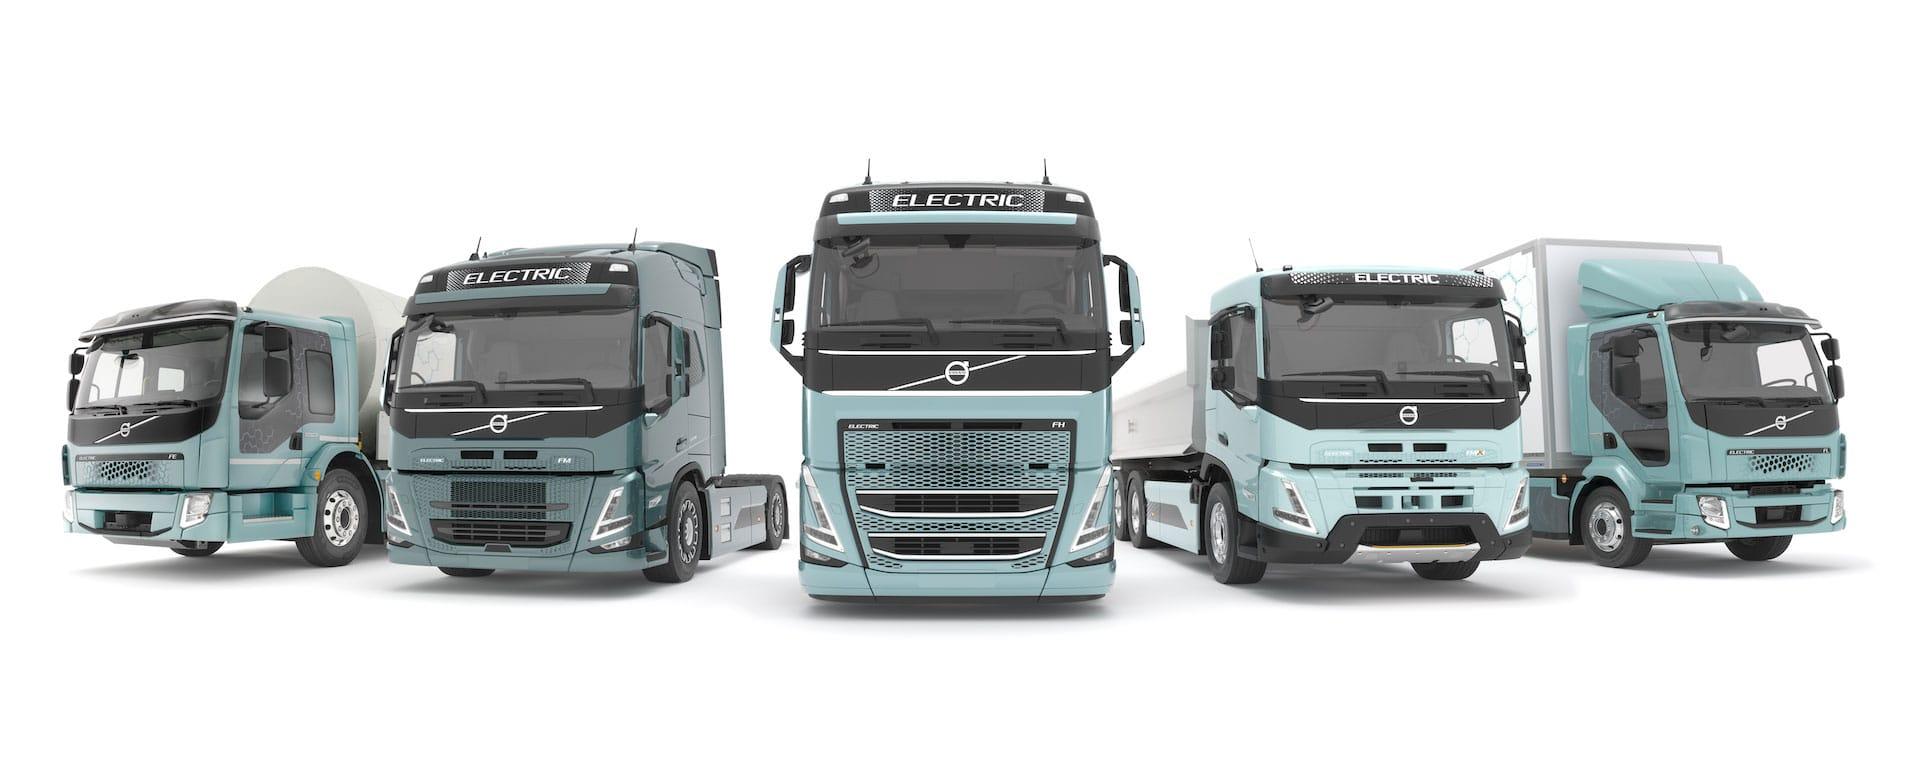 Volvo-Elektro-Lkw-Palette